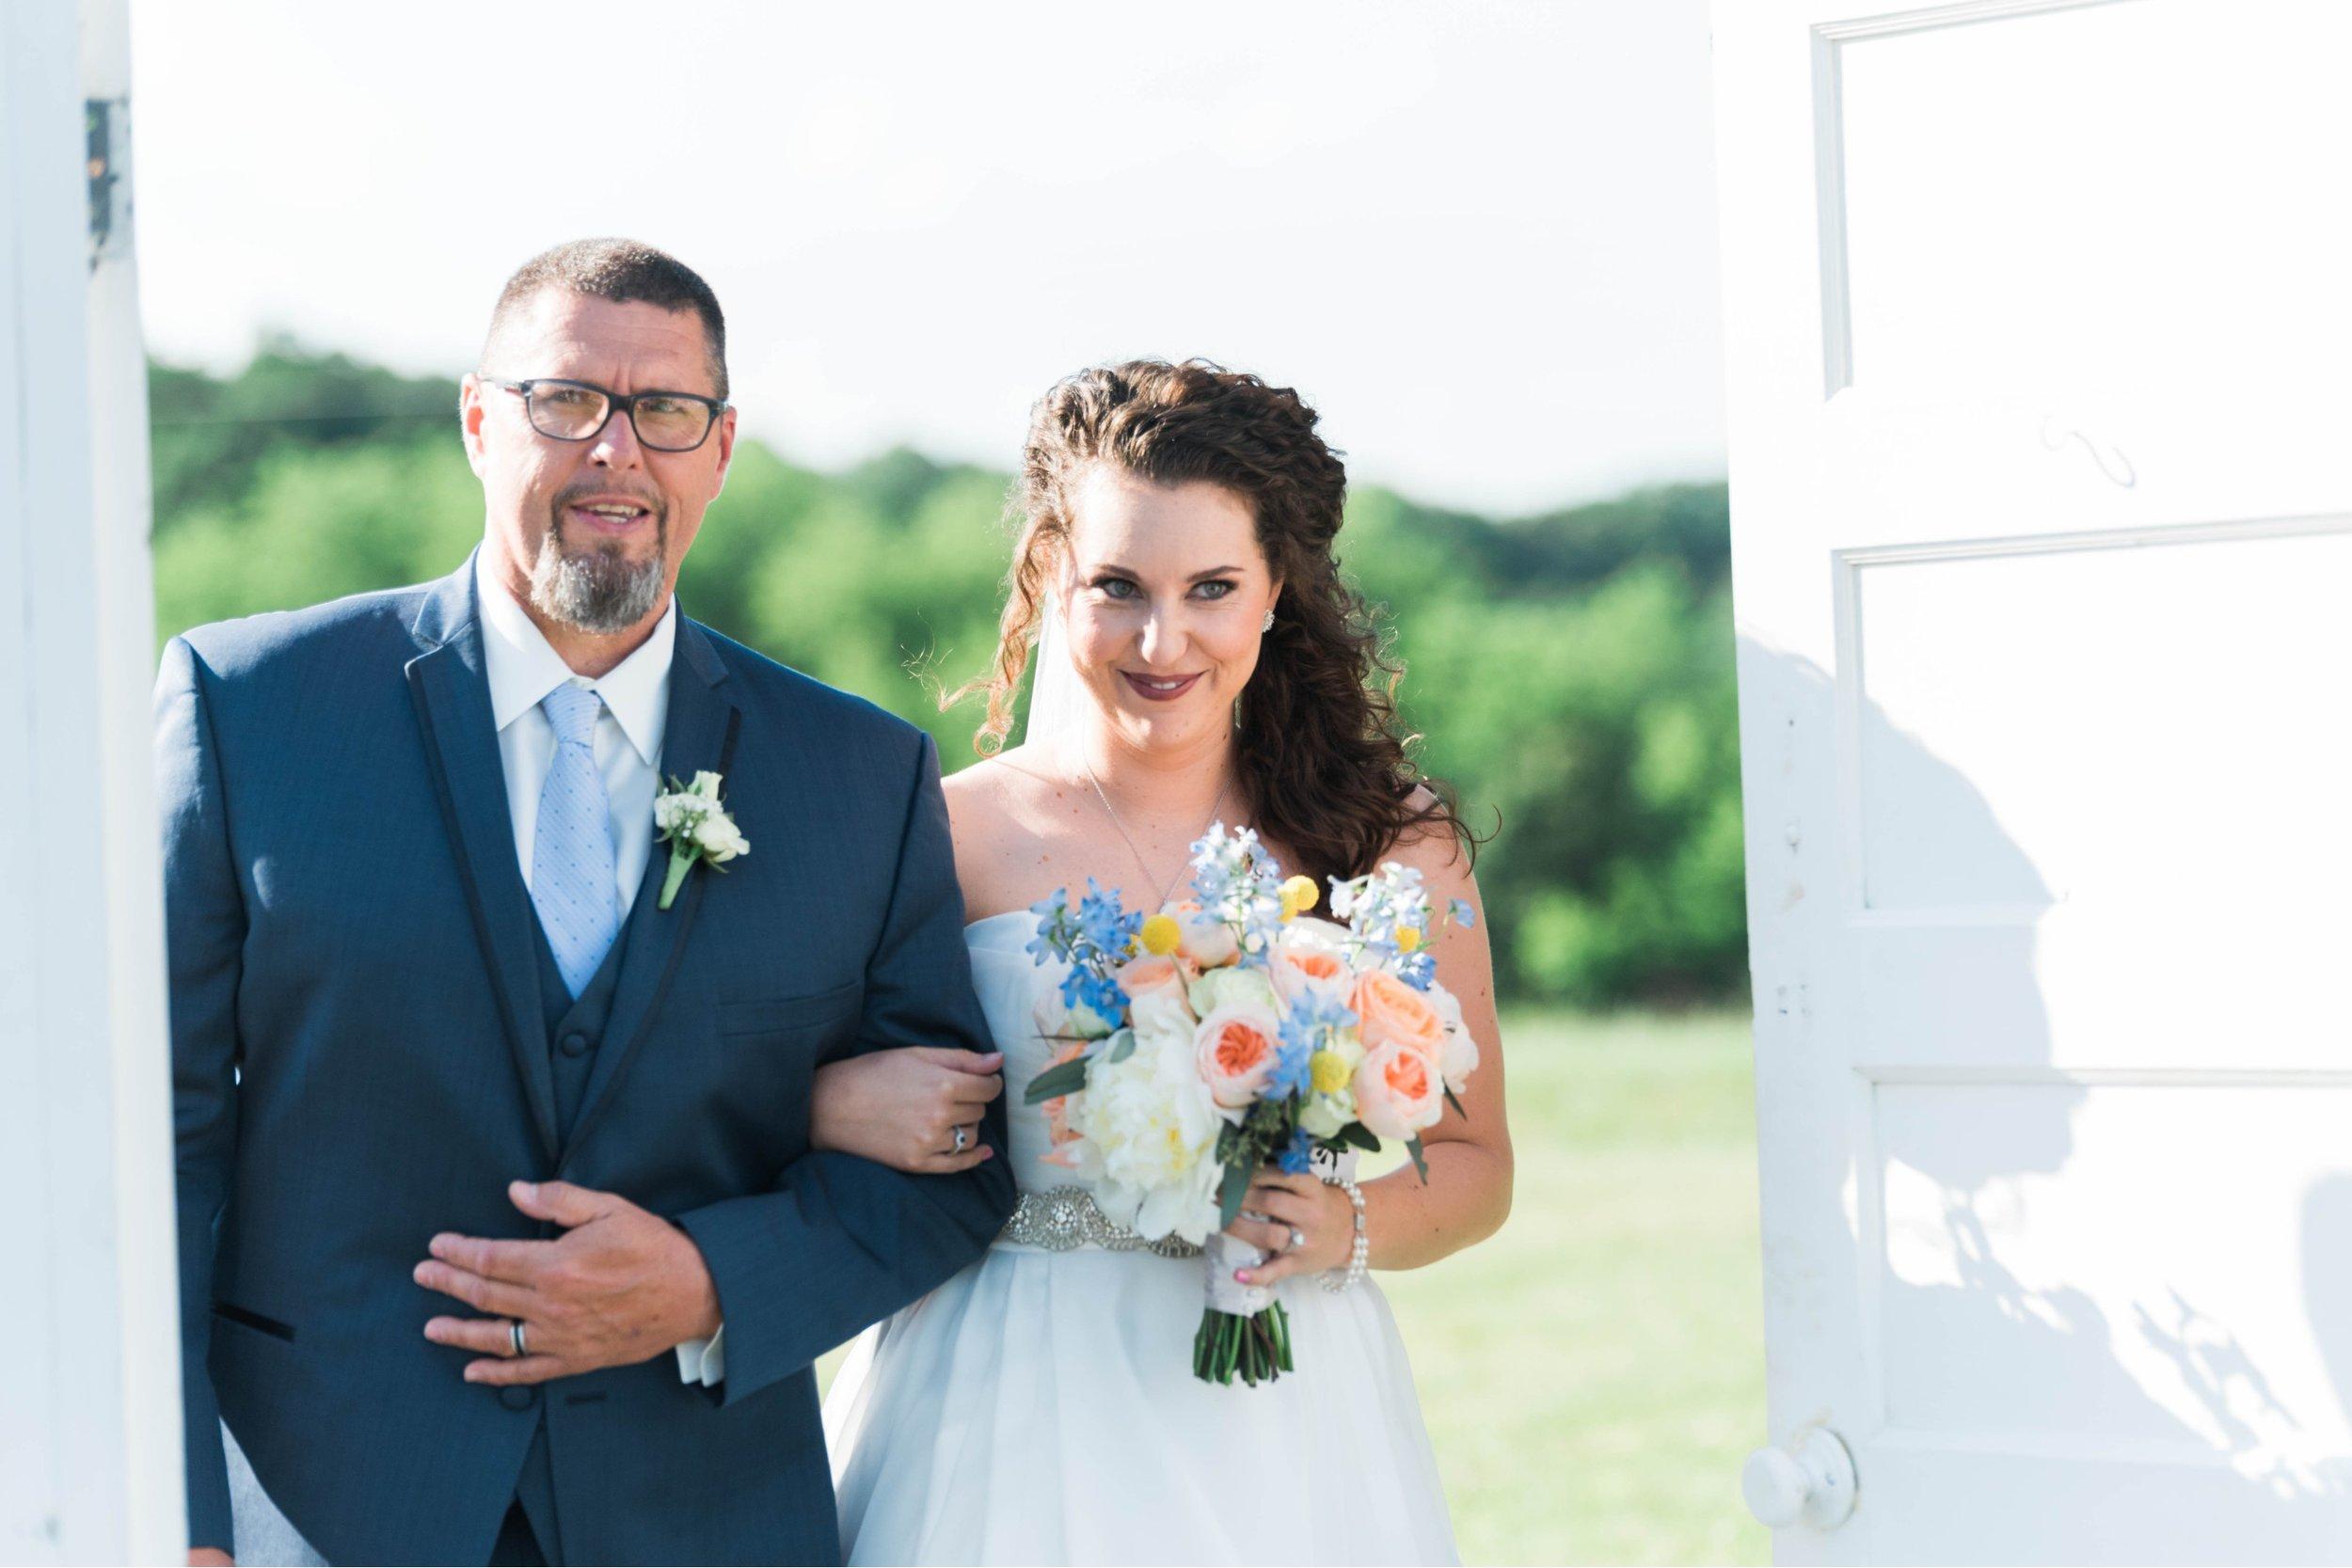 SorellaFarms_EvingtonVA_Lynchburgweddingphotographer_VirginiaweddingPhotographer_AshleyAndrewSorellaFarmsWedding 39.jpg